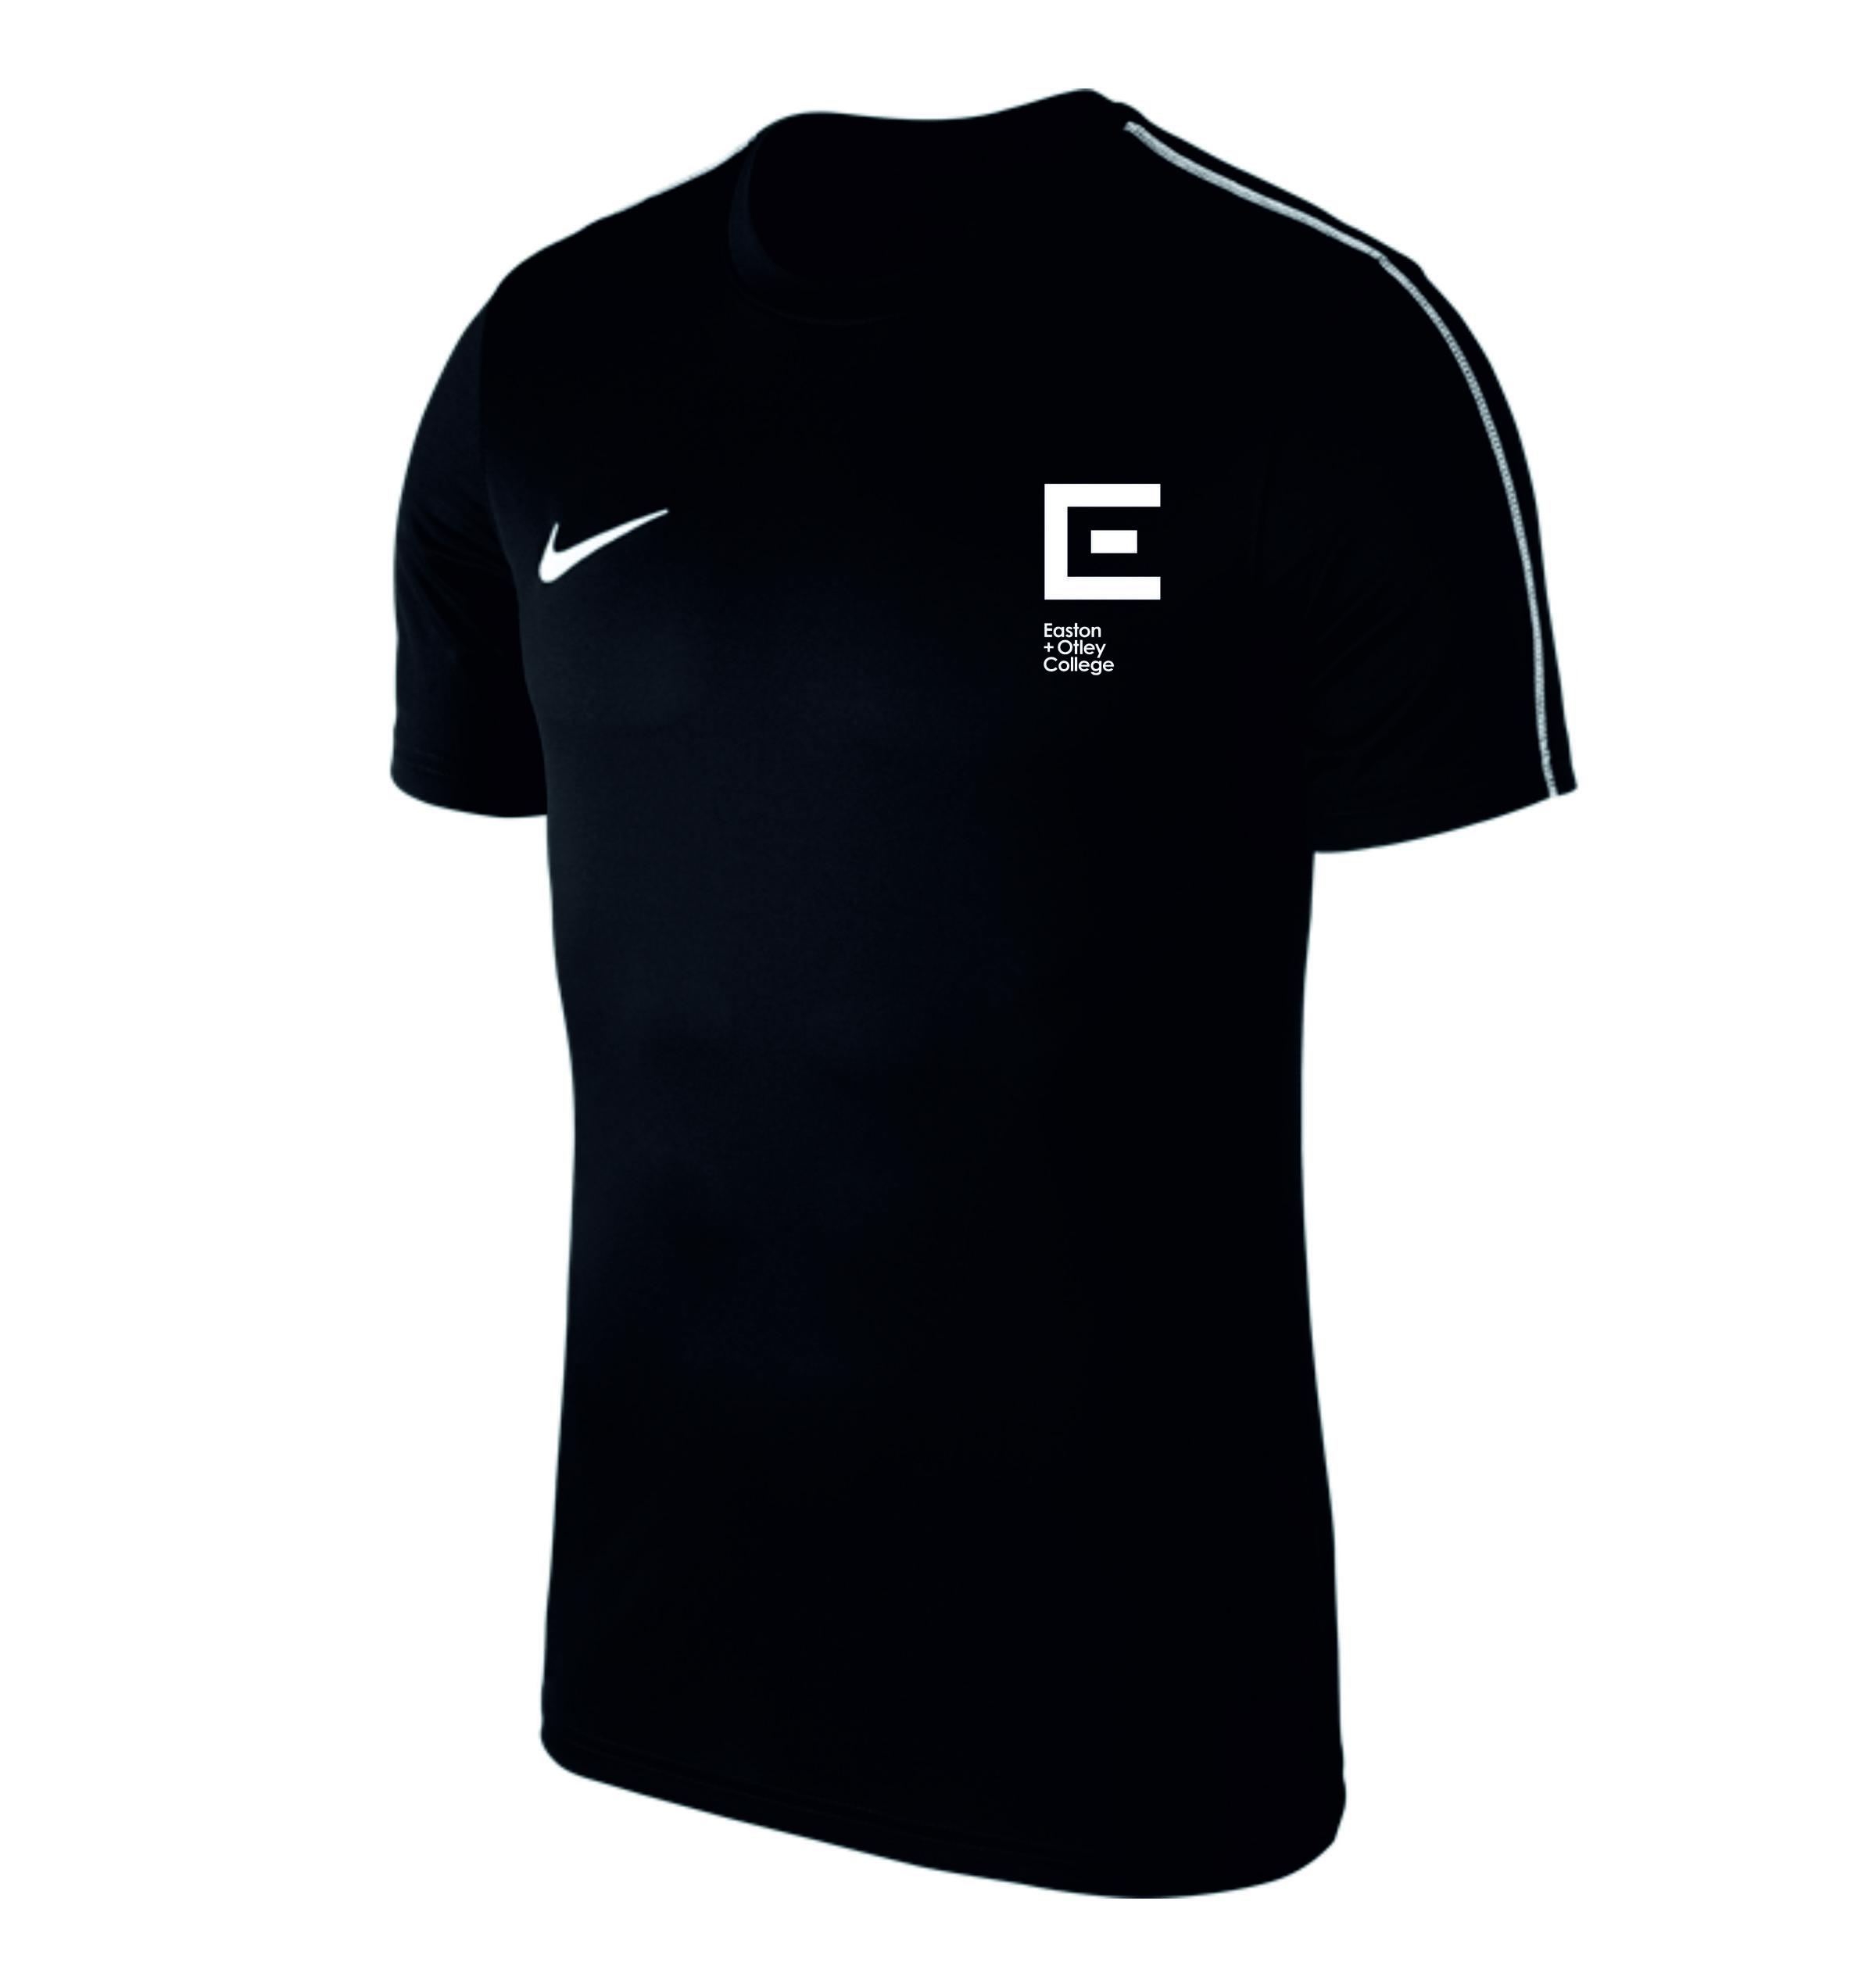 Easton Academy Black T